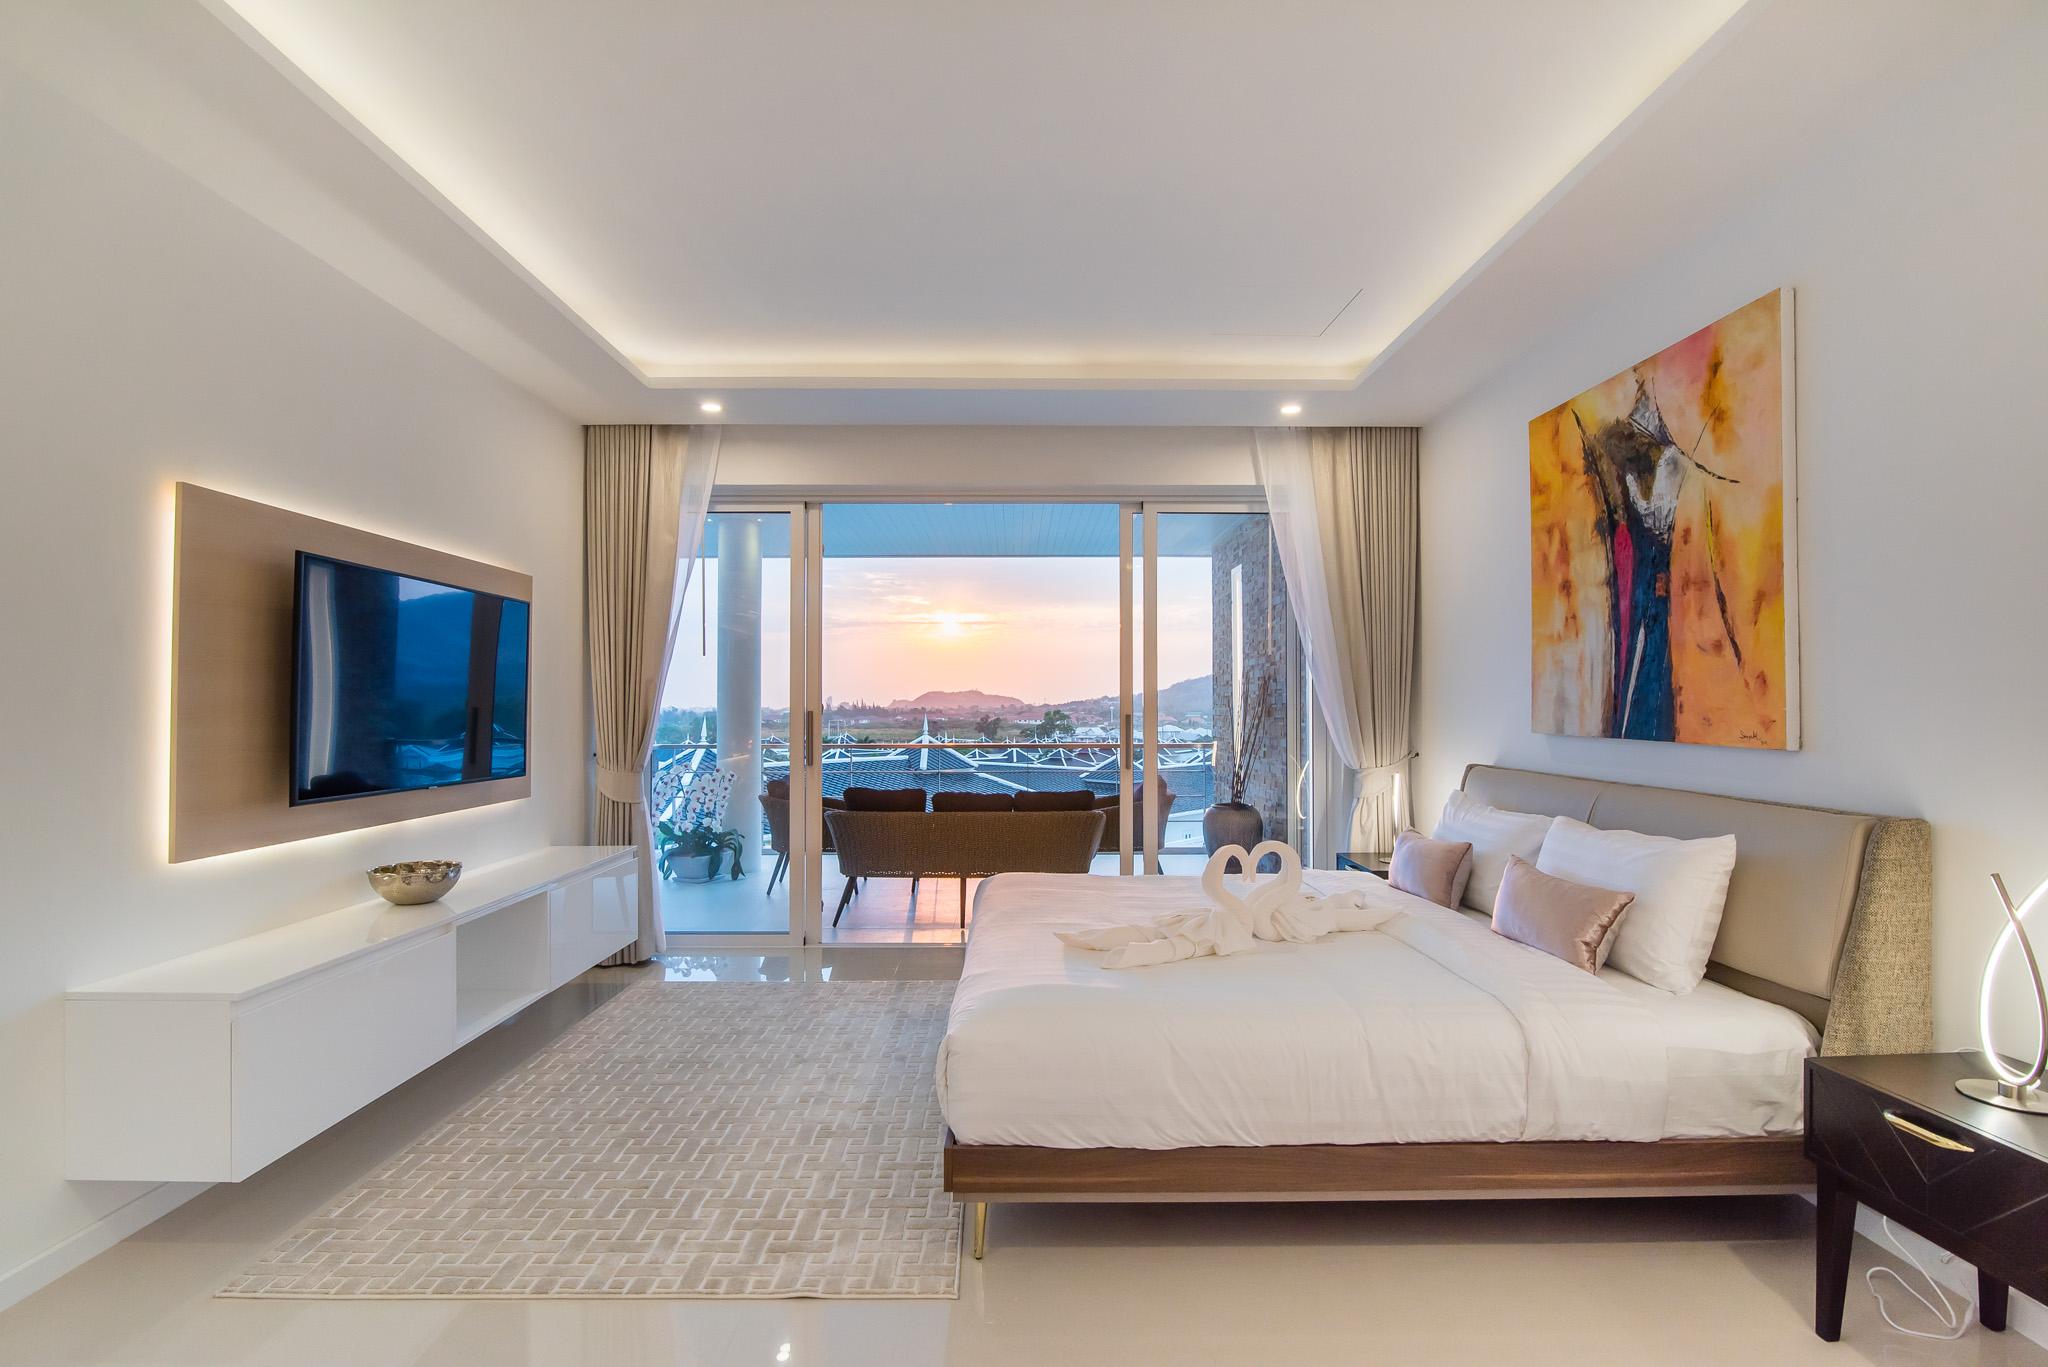 FHT Upper Master bedroom